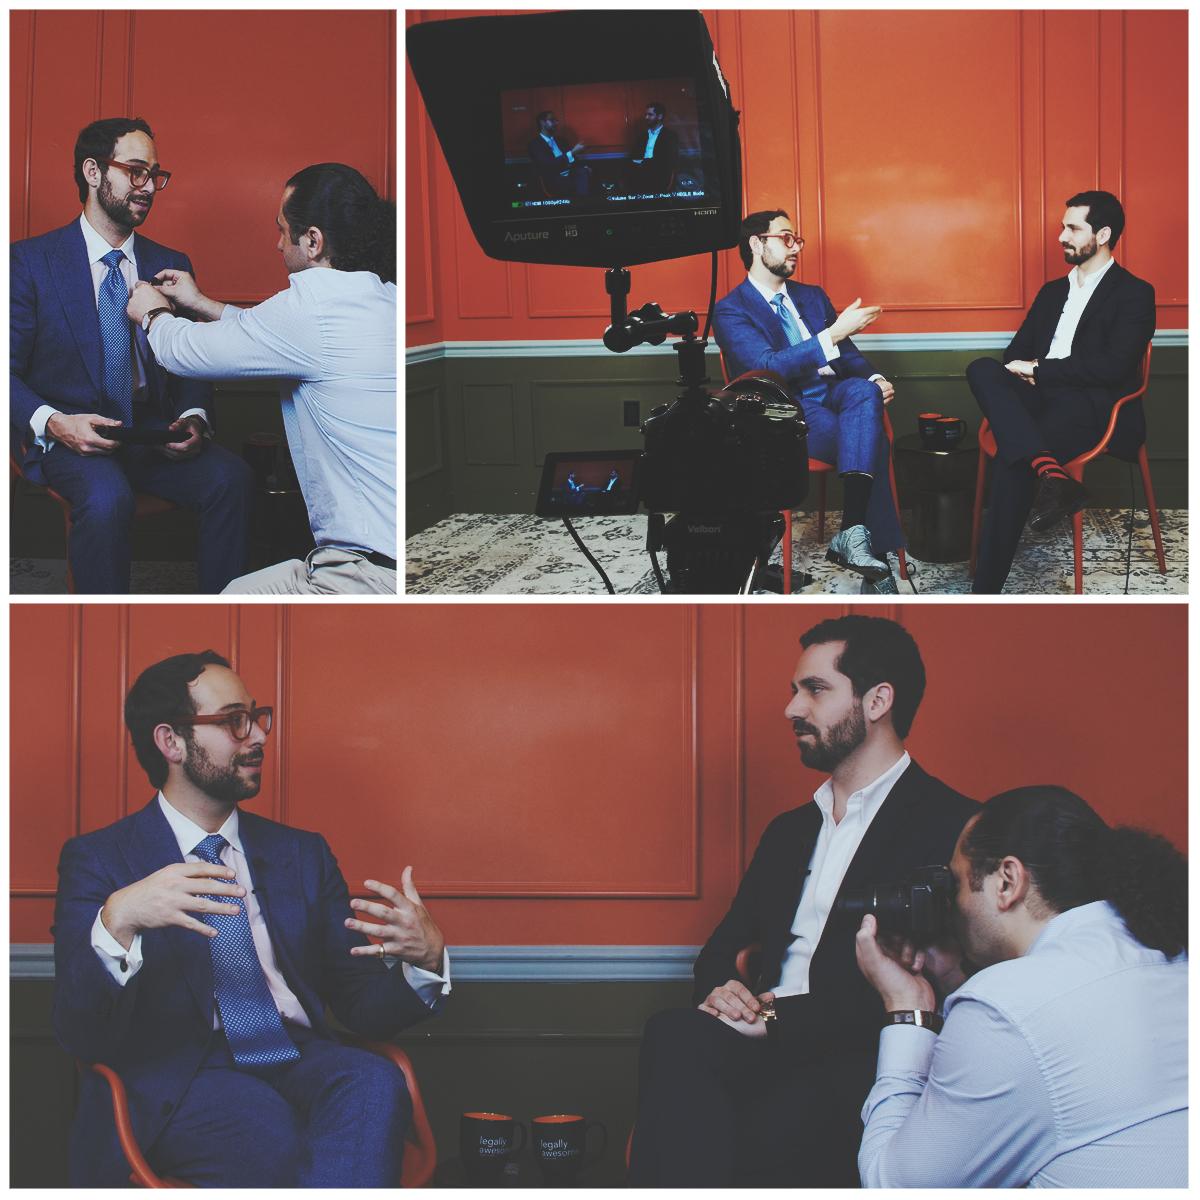 Masar filming an interview with Harvard Law School Professor